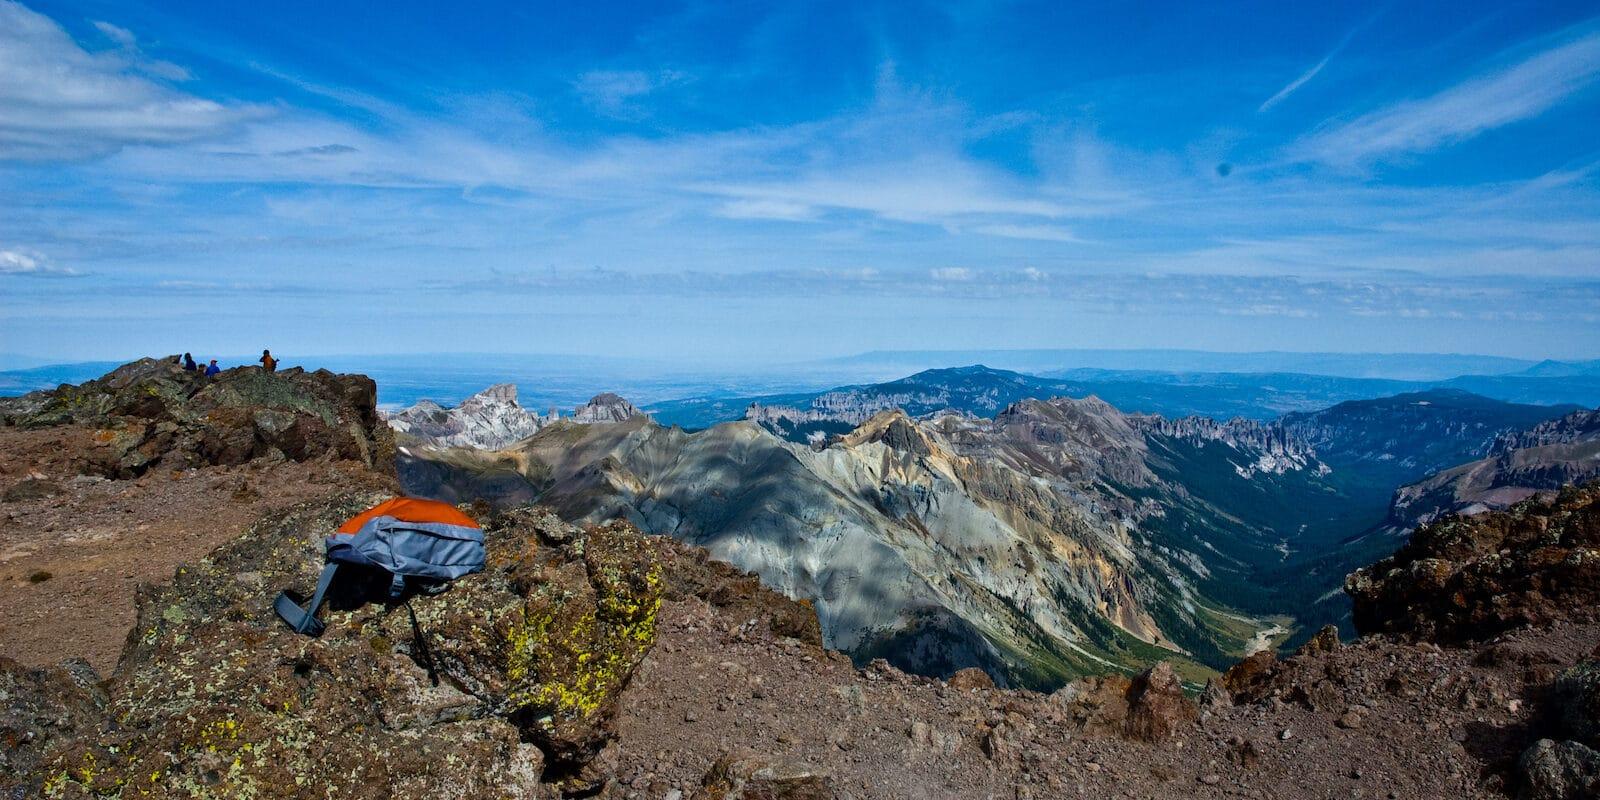 Hiking Uncompahgre Peak Montrose CO